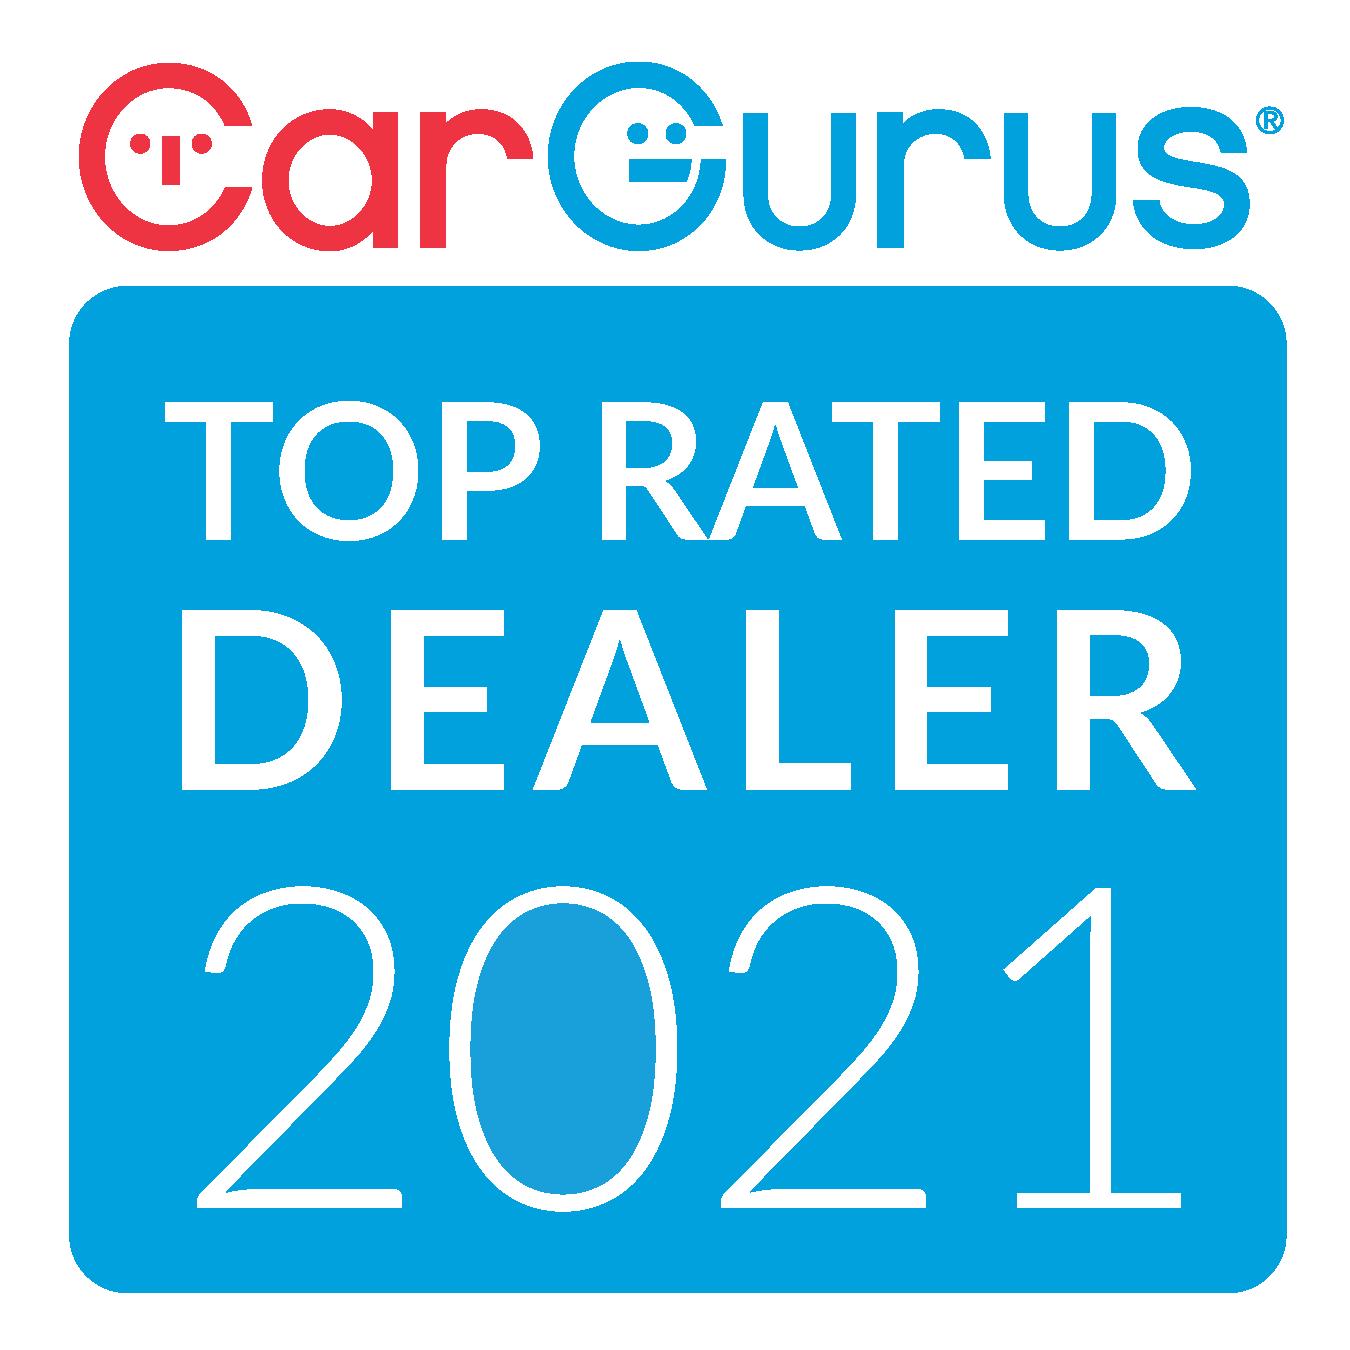 2021 Car Gurus Top Rated Dealer 2021